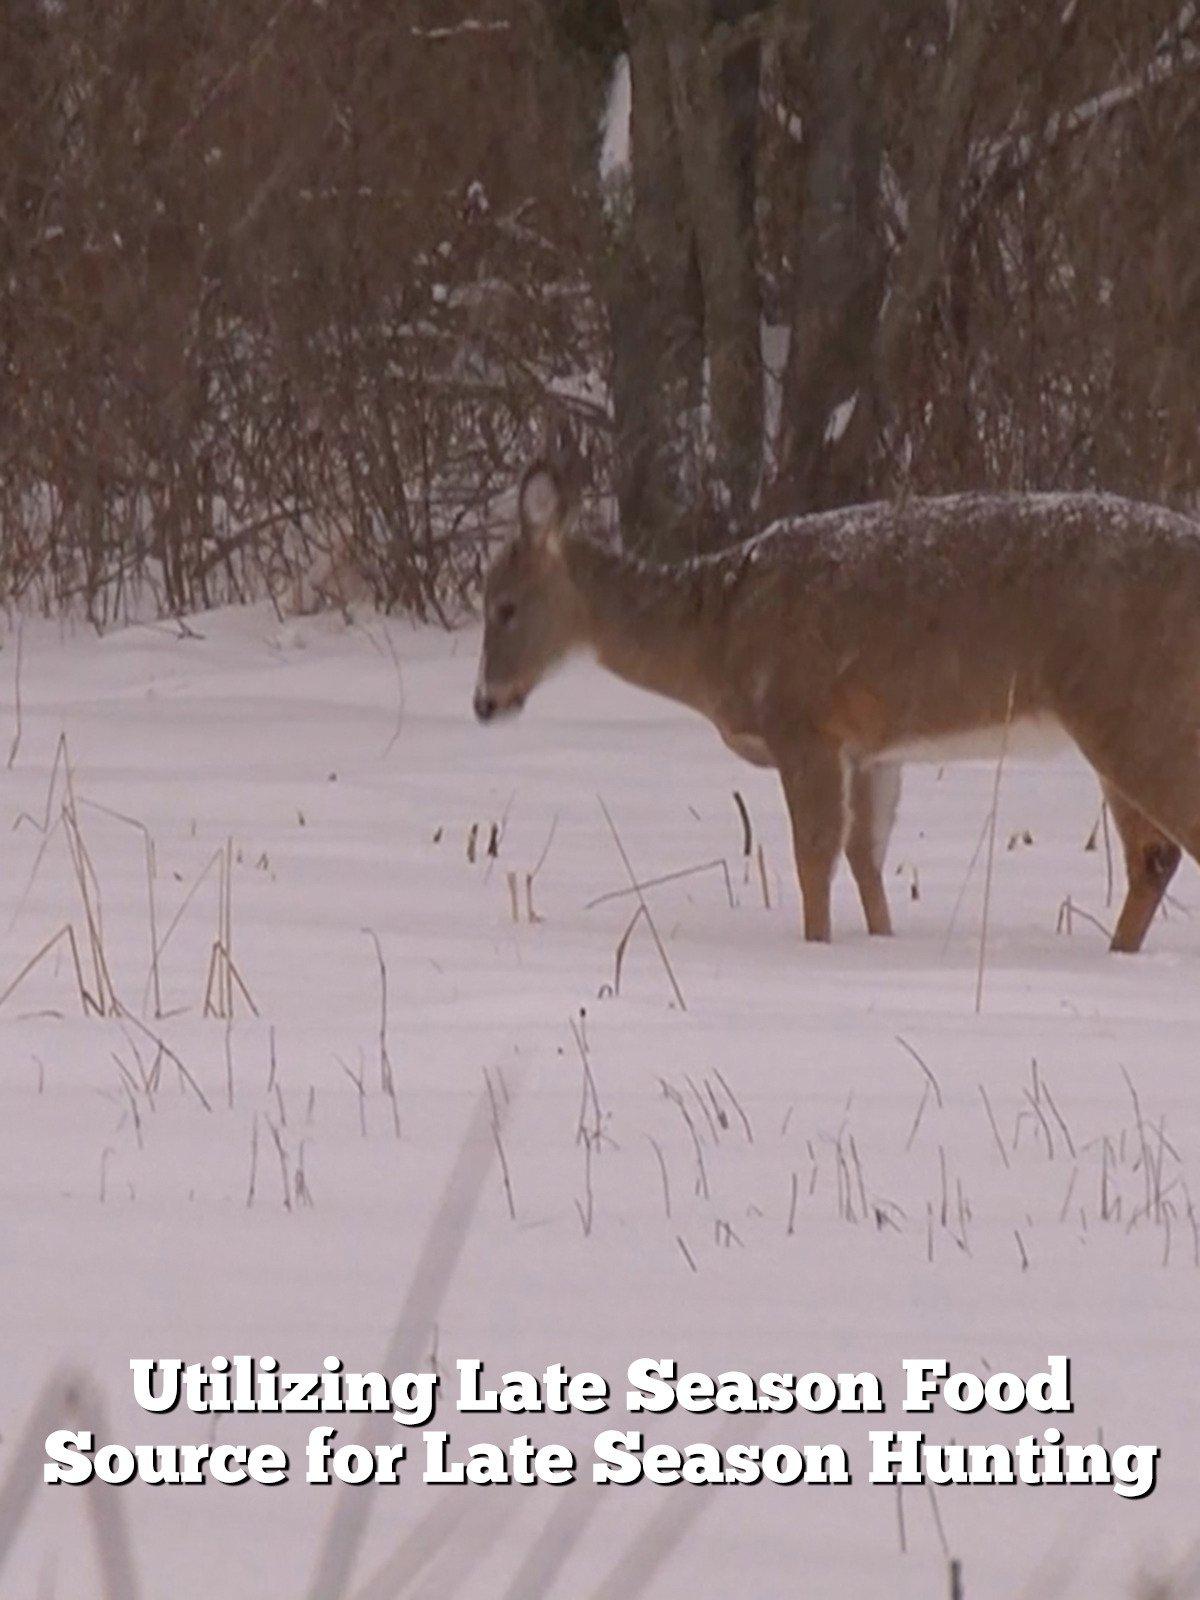 Utilizing Late Season Food Source for Late Season Hunting